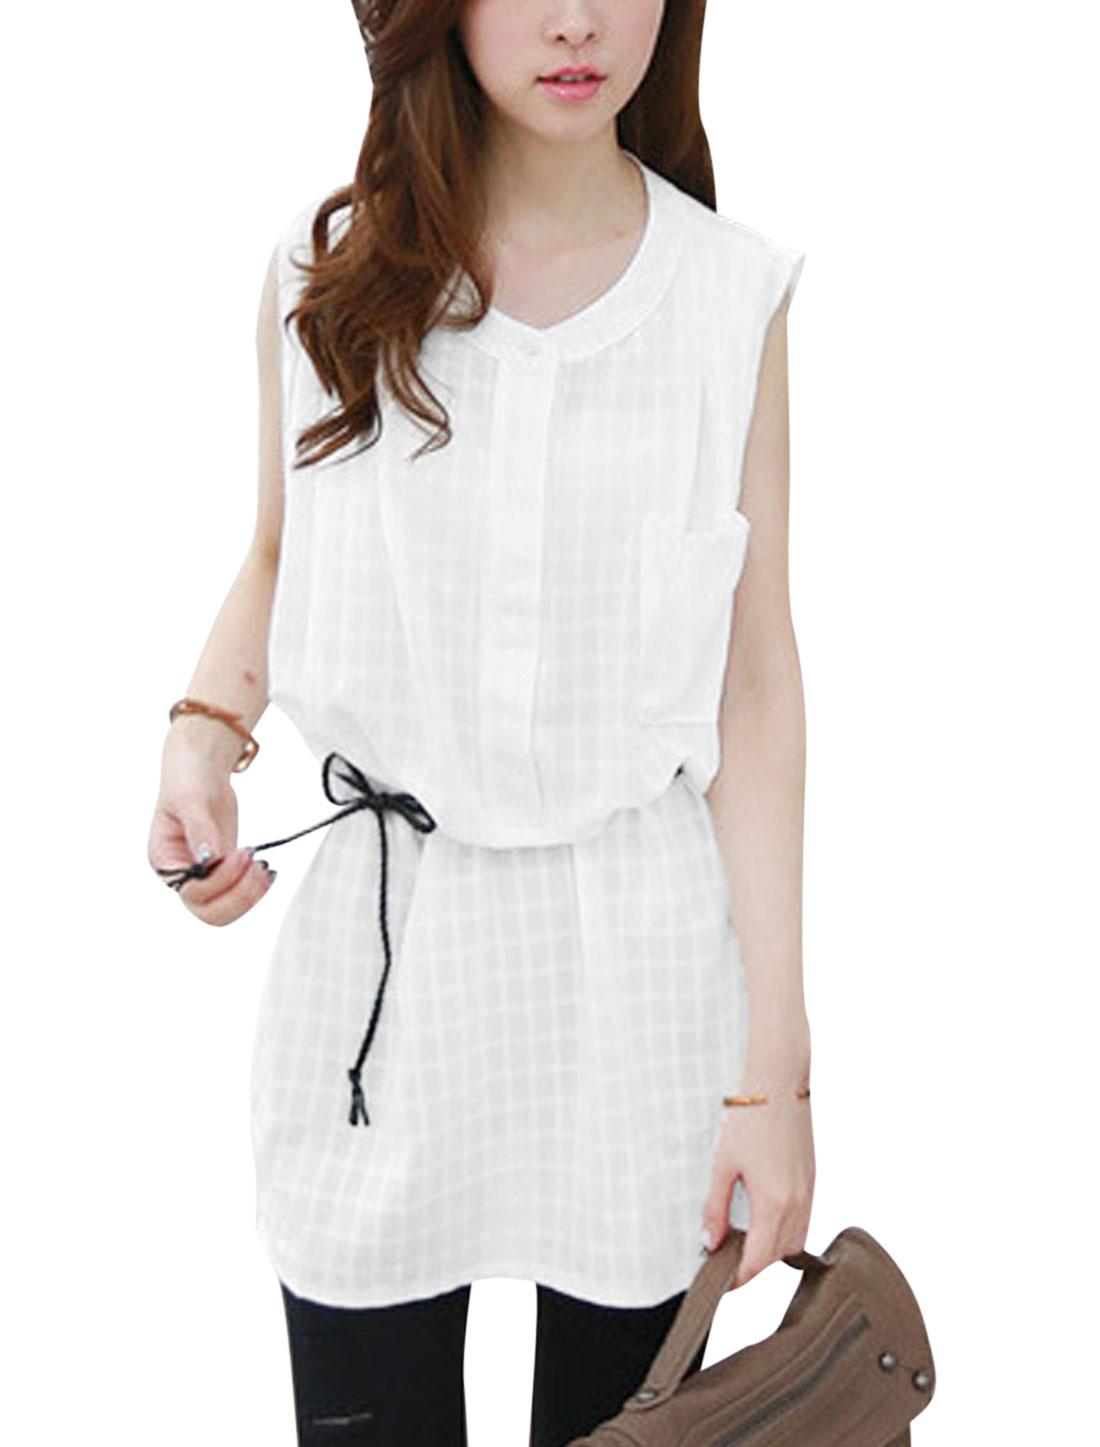 Ladies Plaids Design Button Closed Sweet Linen Top Shirt White S